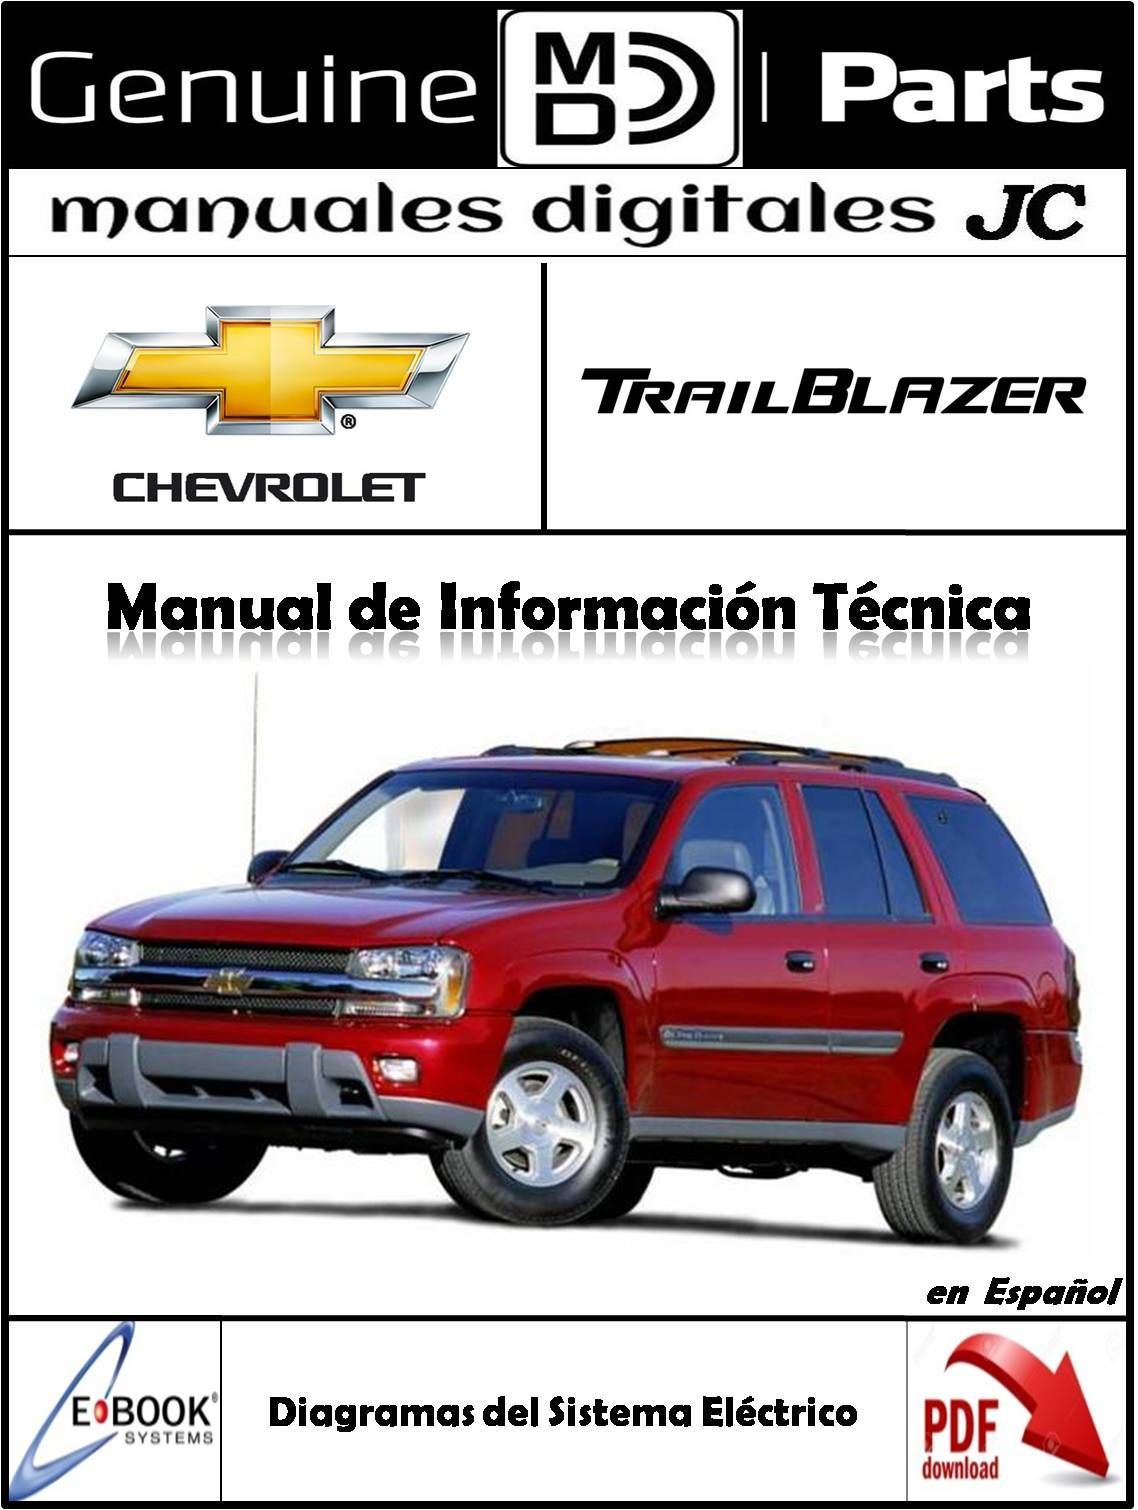 Manual Diagramas Del Sistema Electrico Chevrolet Trailblazer Correo Manualesdigitalesjc Gmail Com Tlfs 58 Sistema Electrico Chevrolet Trailblazer Electrica